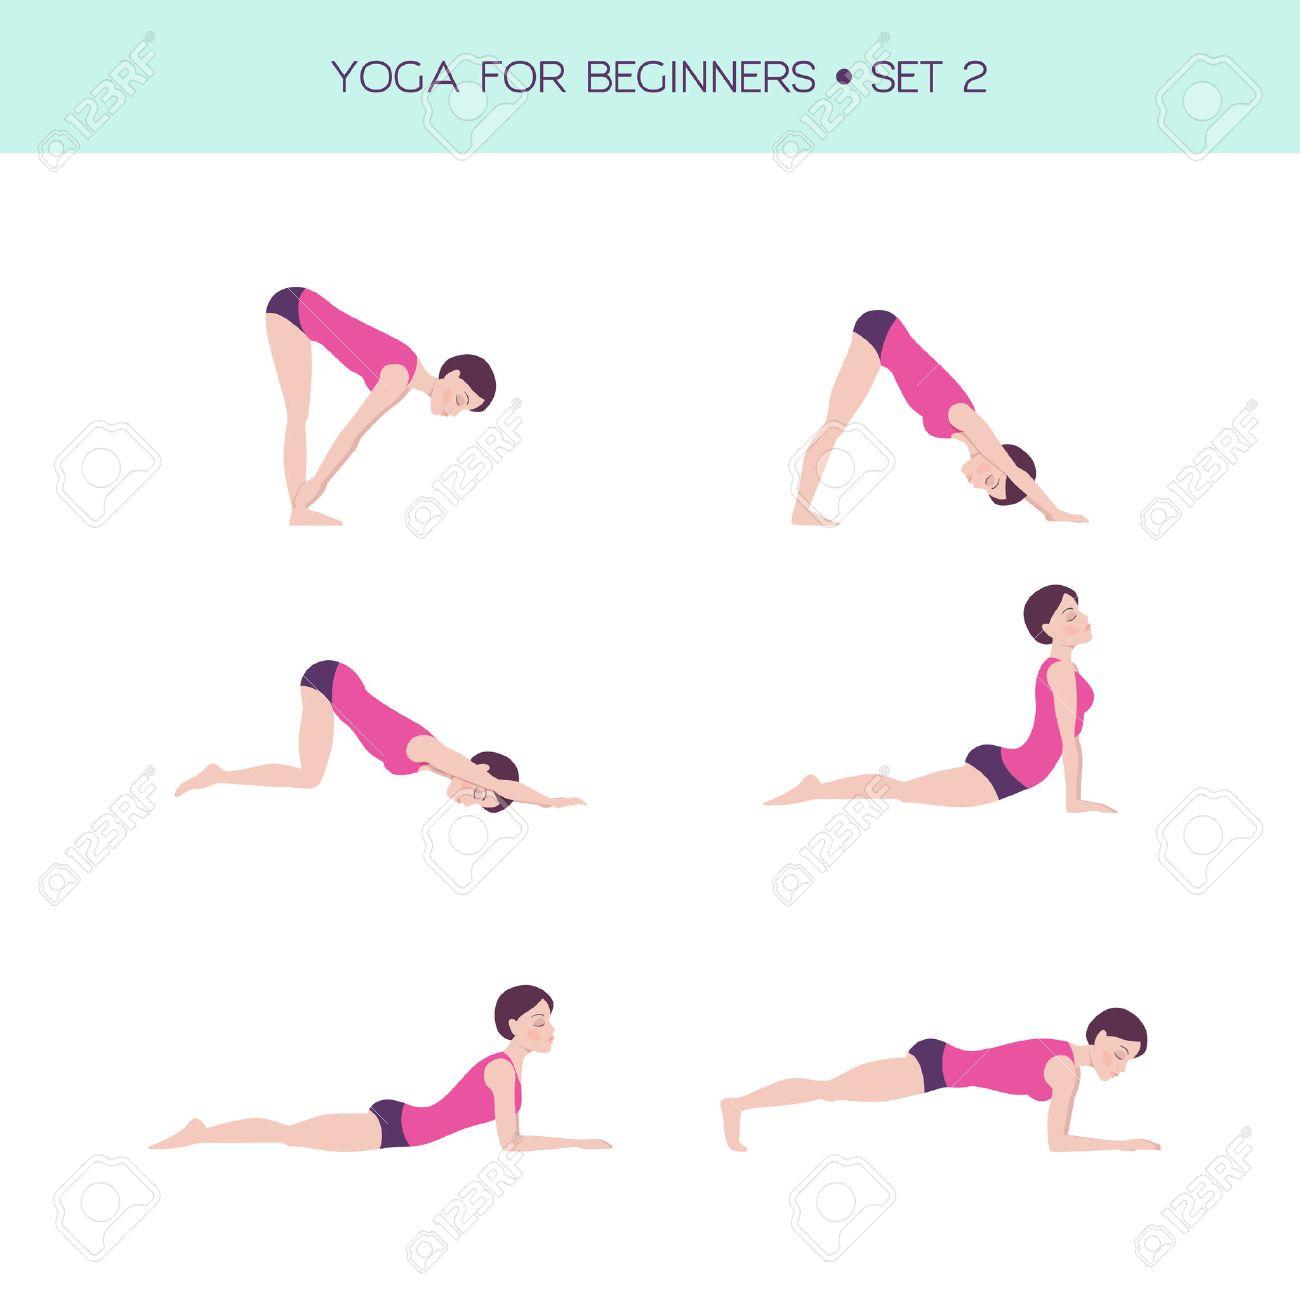 Berühmt Vector Reihe Von Grundlegenden Yoga-Asanas, Yoga Für Anfänger &LR_55